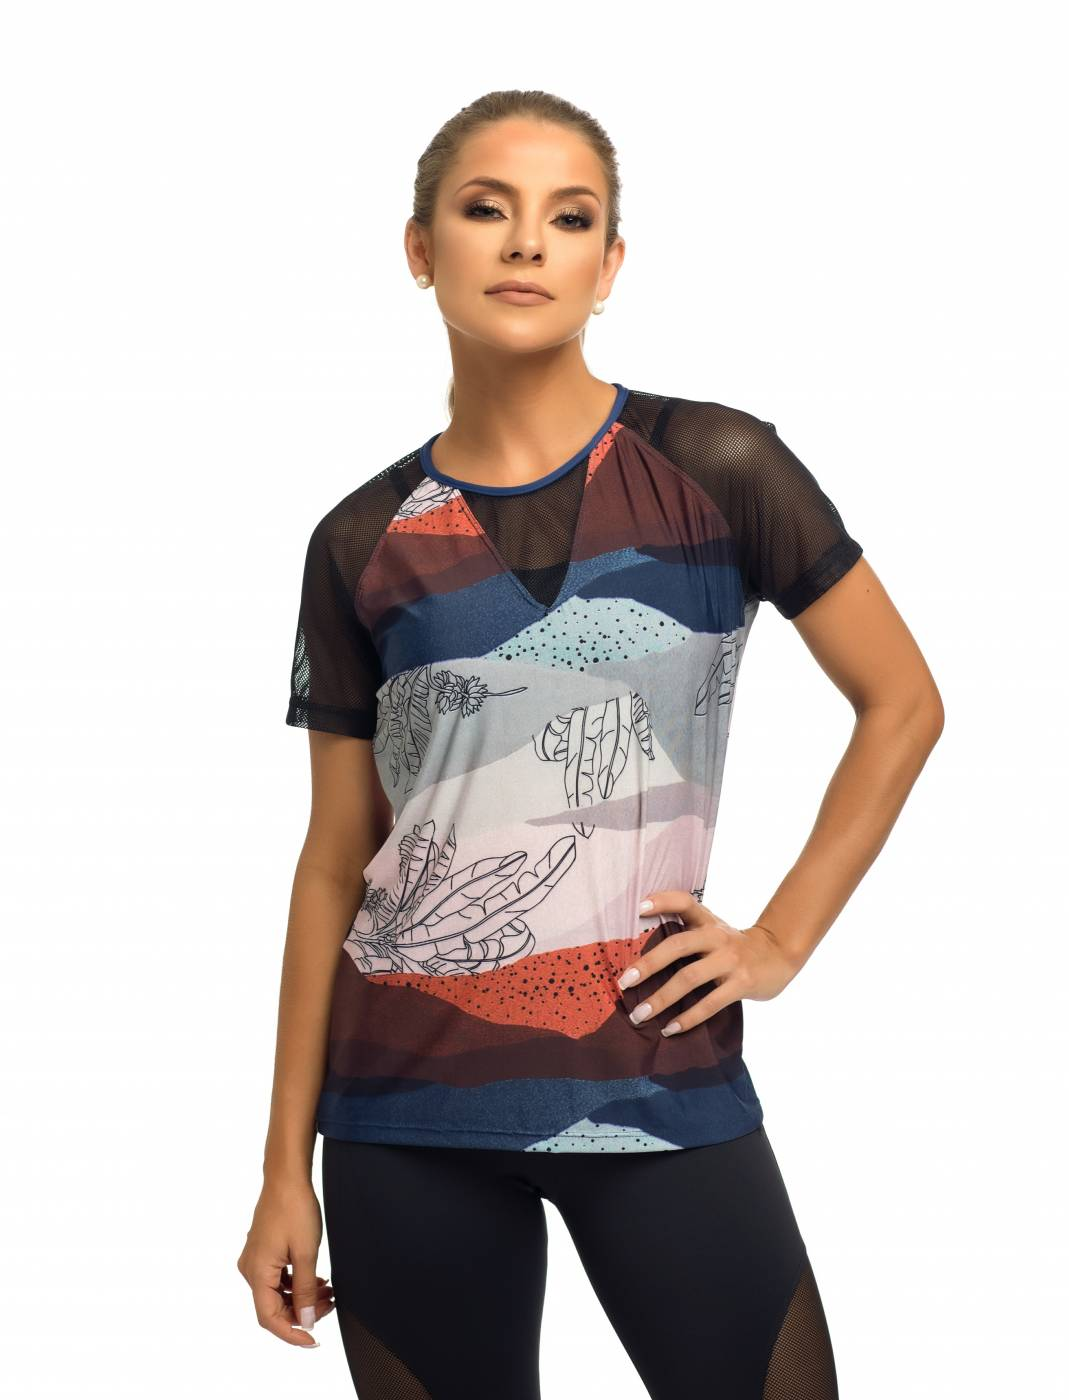 Camisa Fitness - Minas